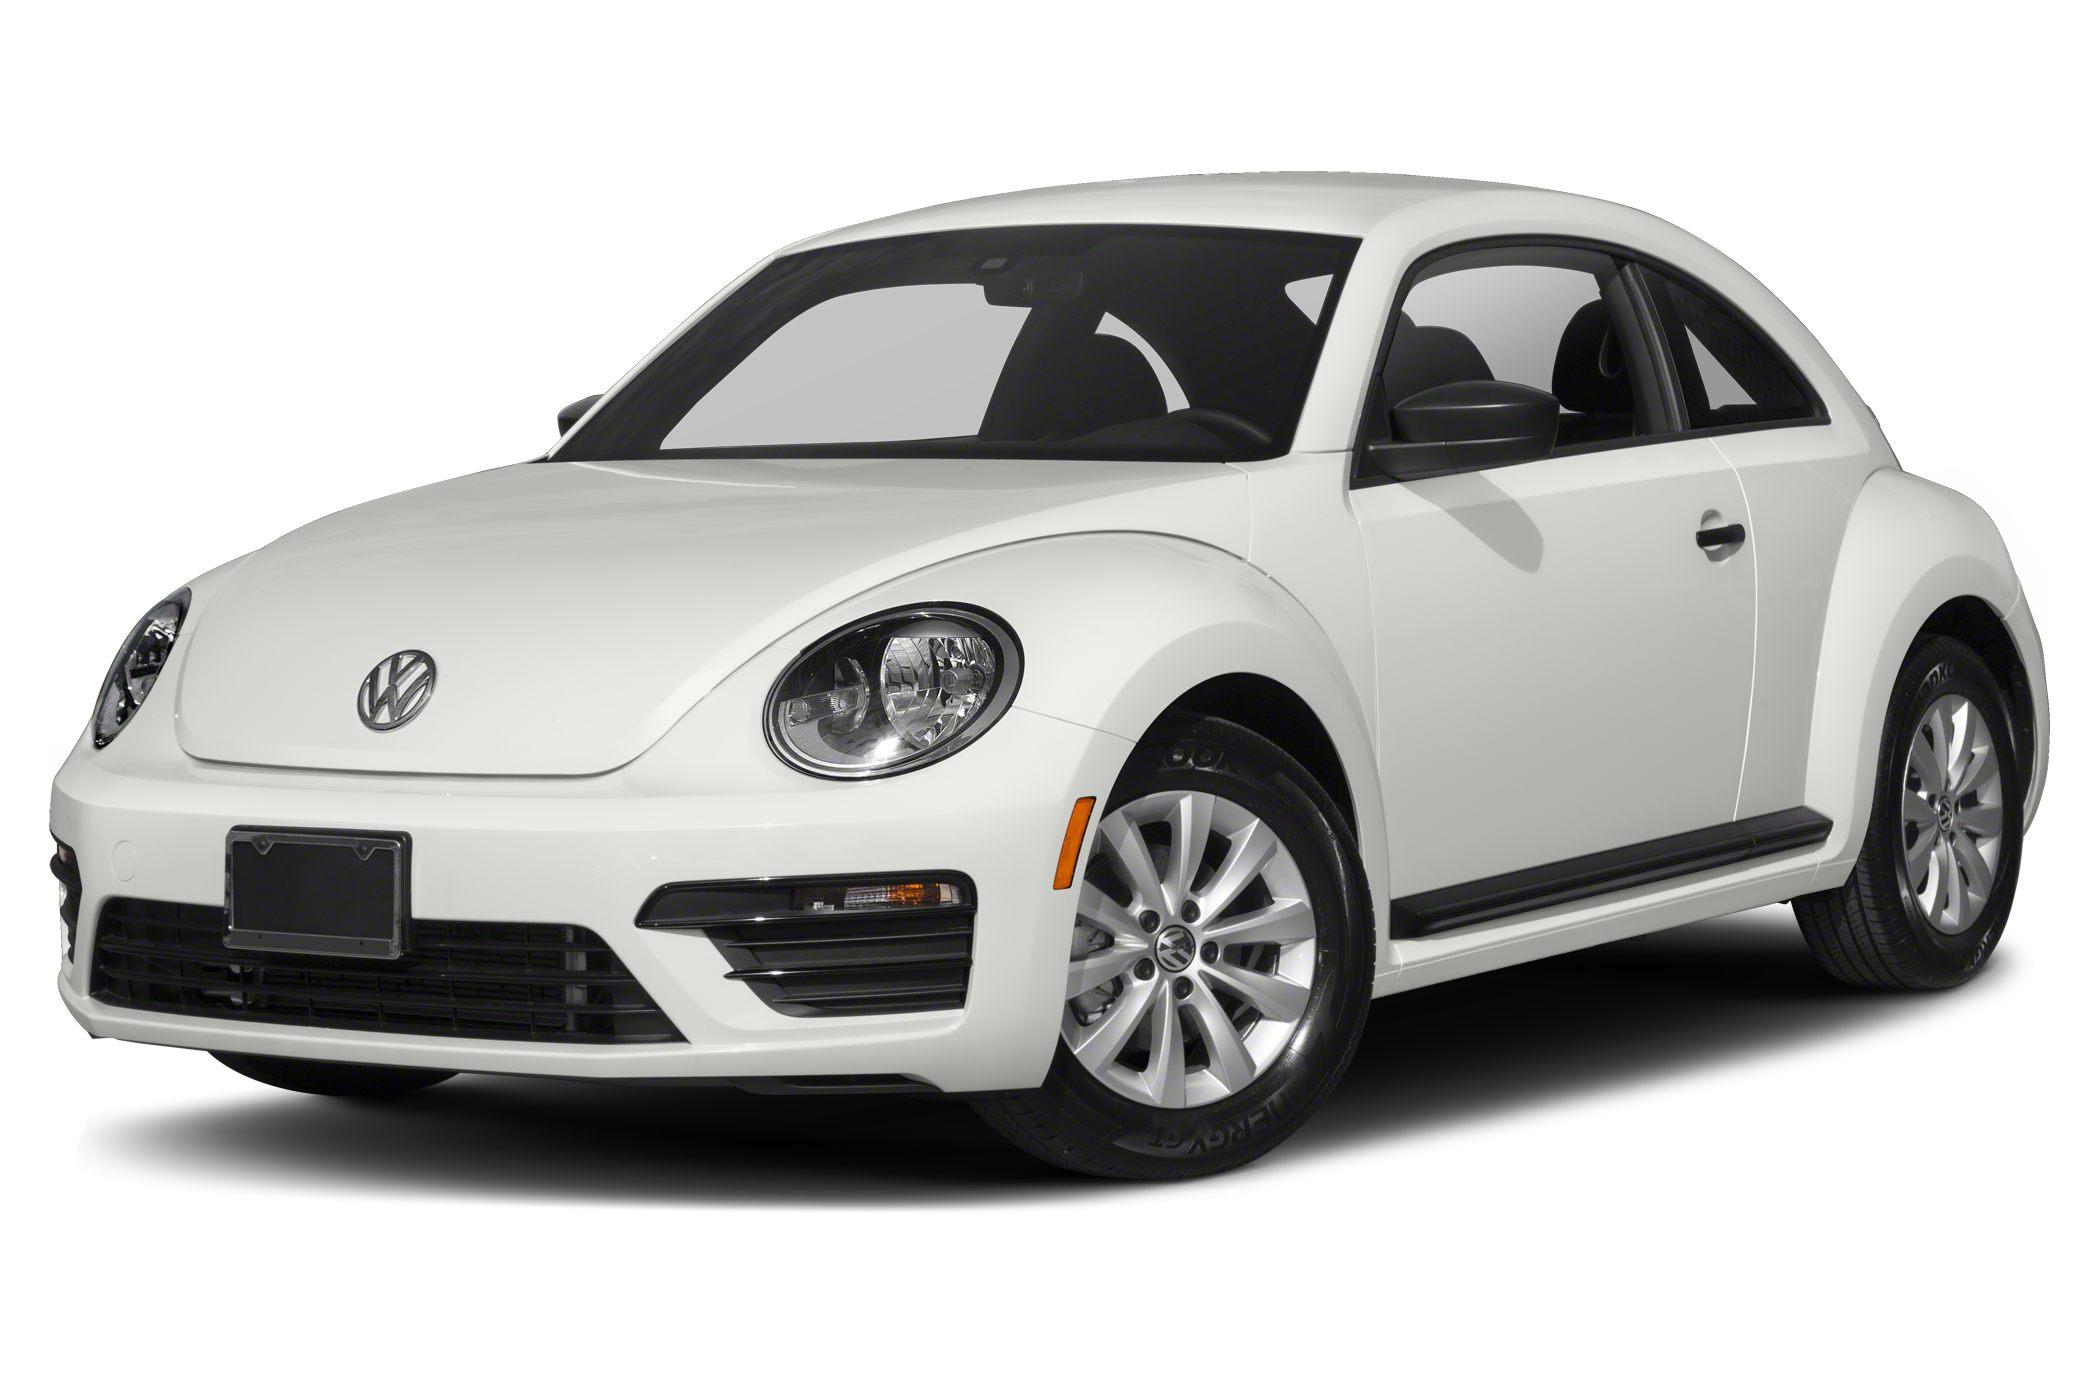 volkswagen beetle pricing reviews and new model information autoblog. Black Bedroom Furniture Sets. Home Design Ideas